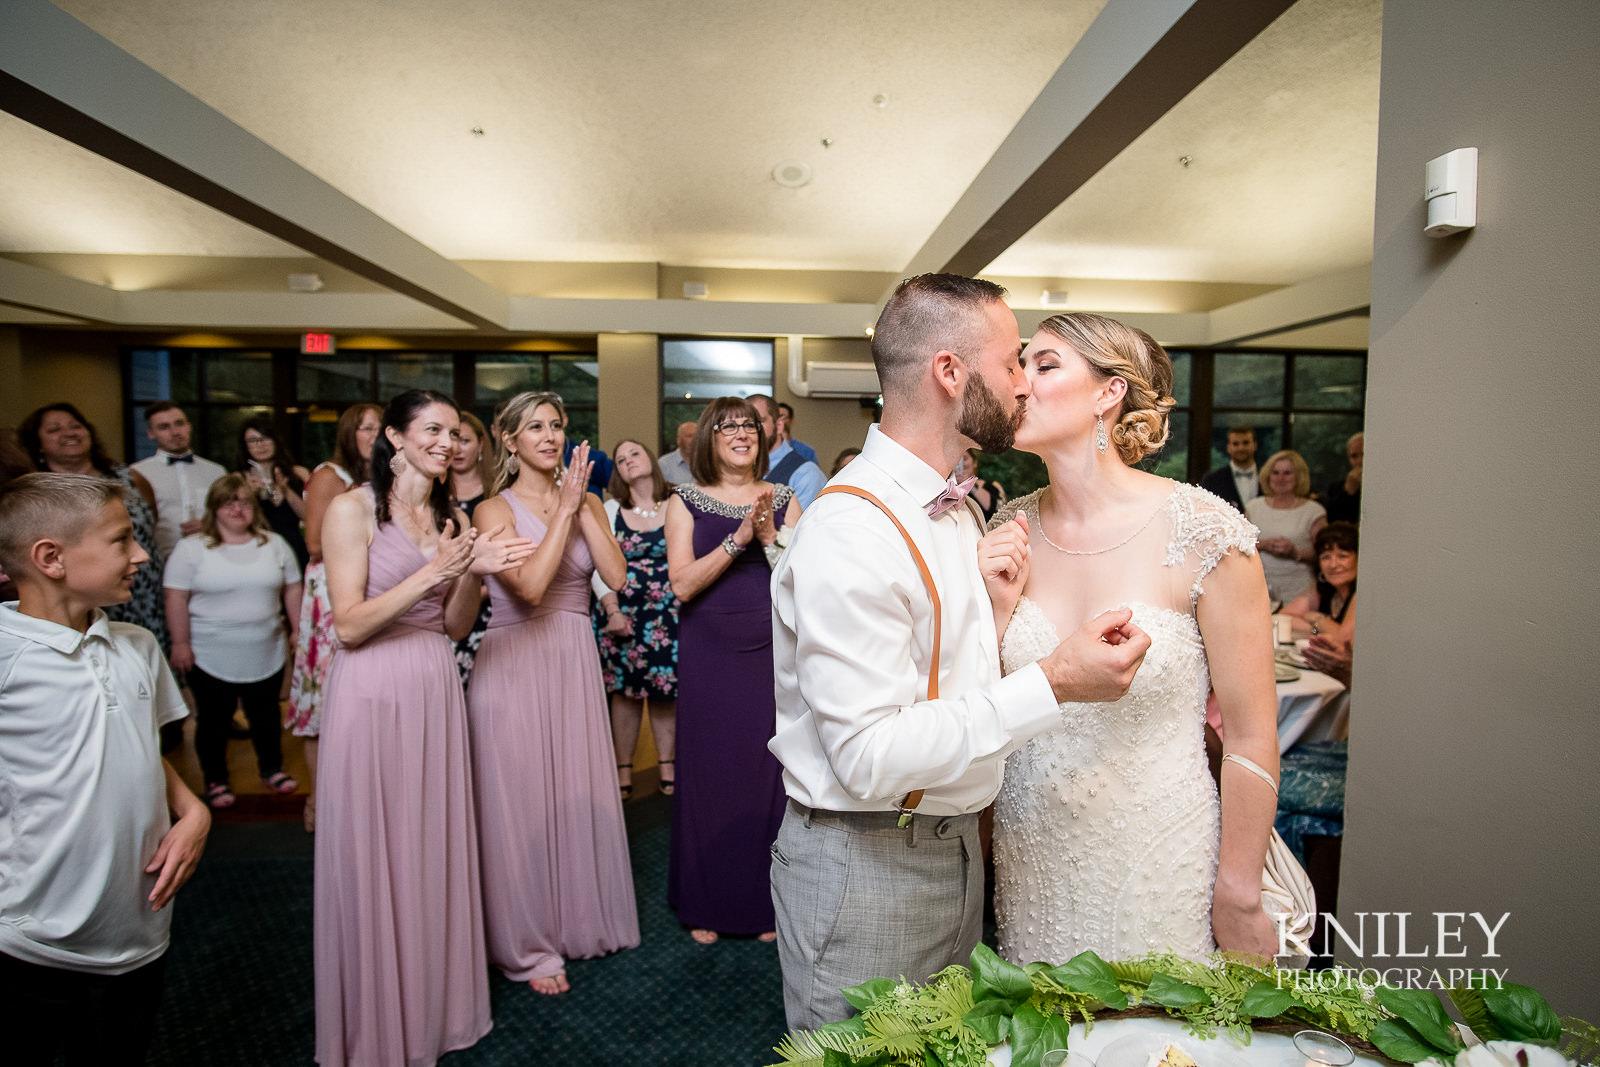 096 - Ontario Golf Club Wedding Pictures - XT2B9216.jpg